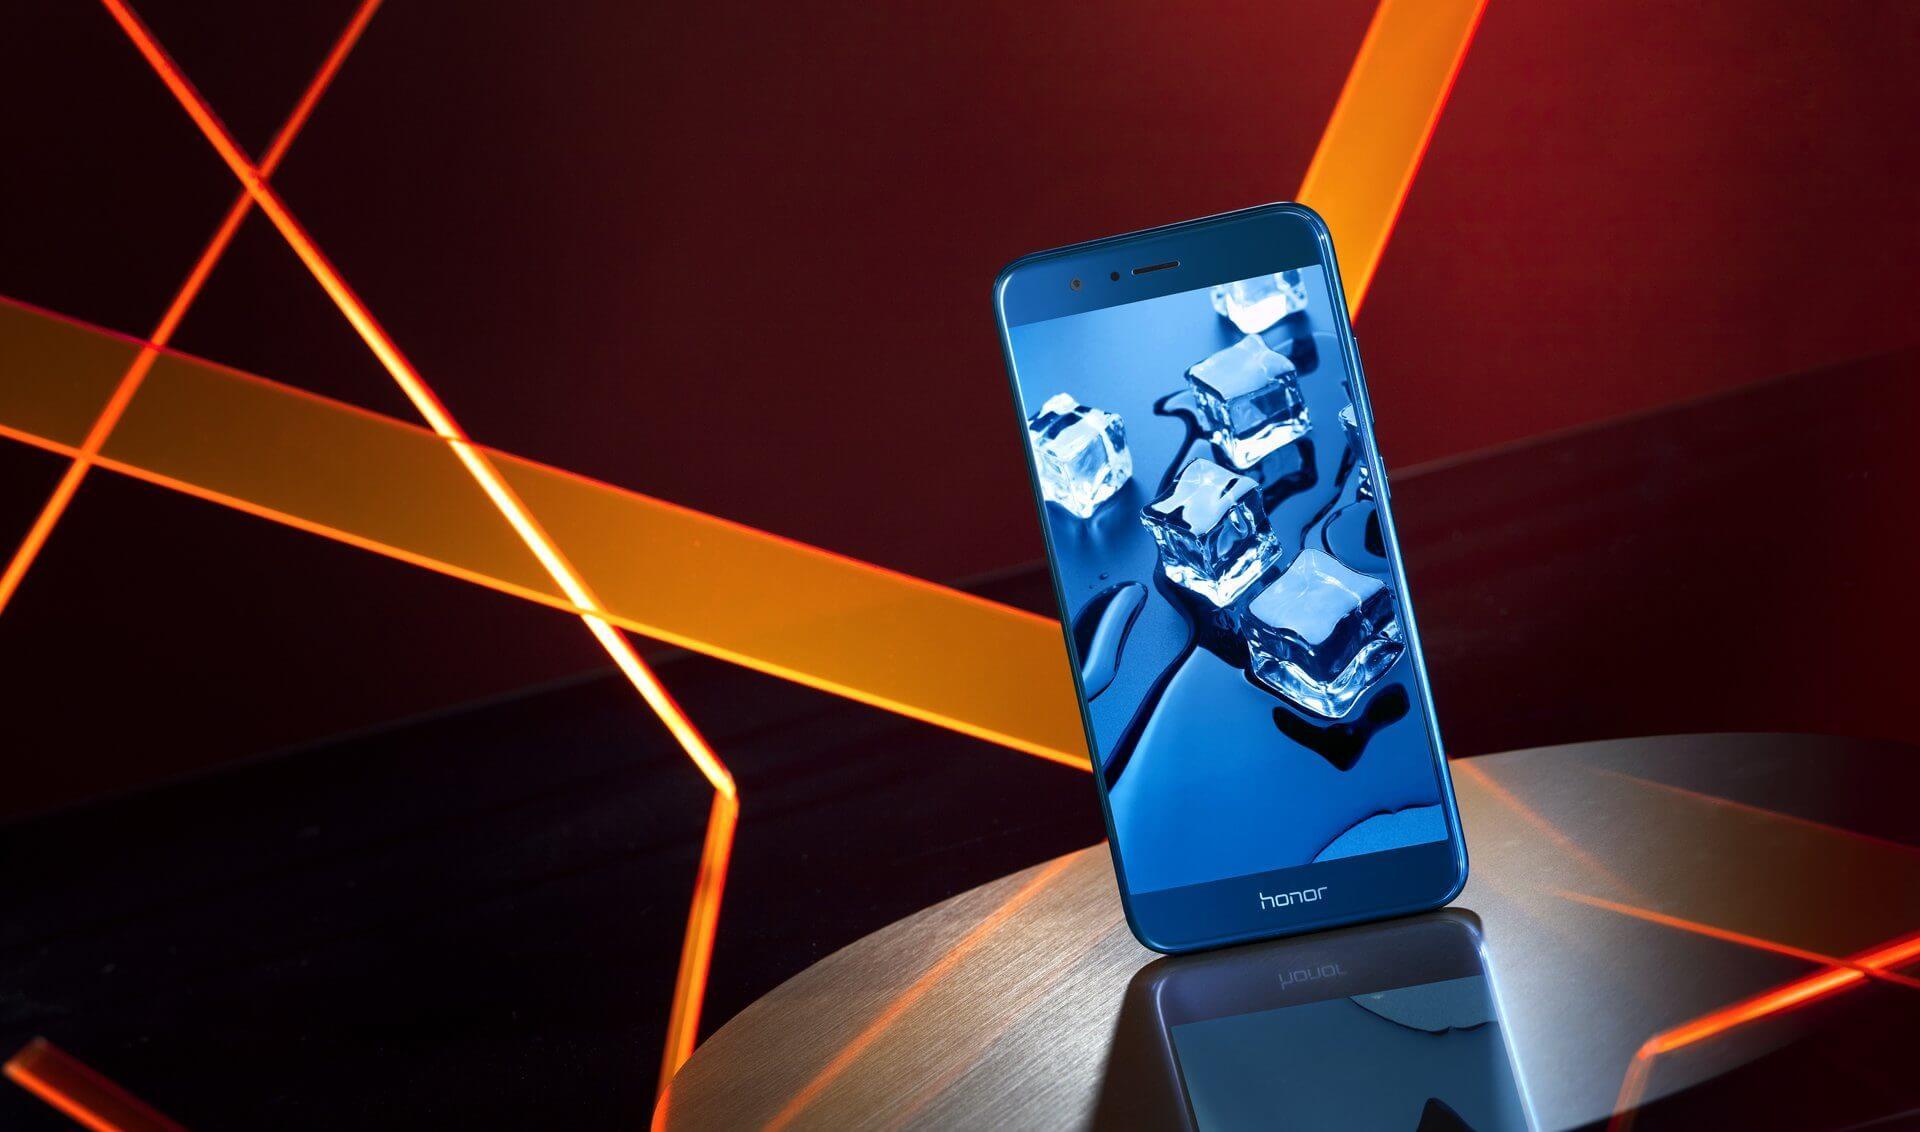 Huawei Honor V9 6/64Gb